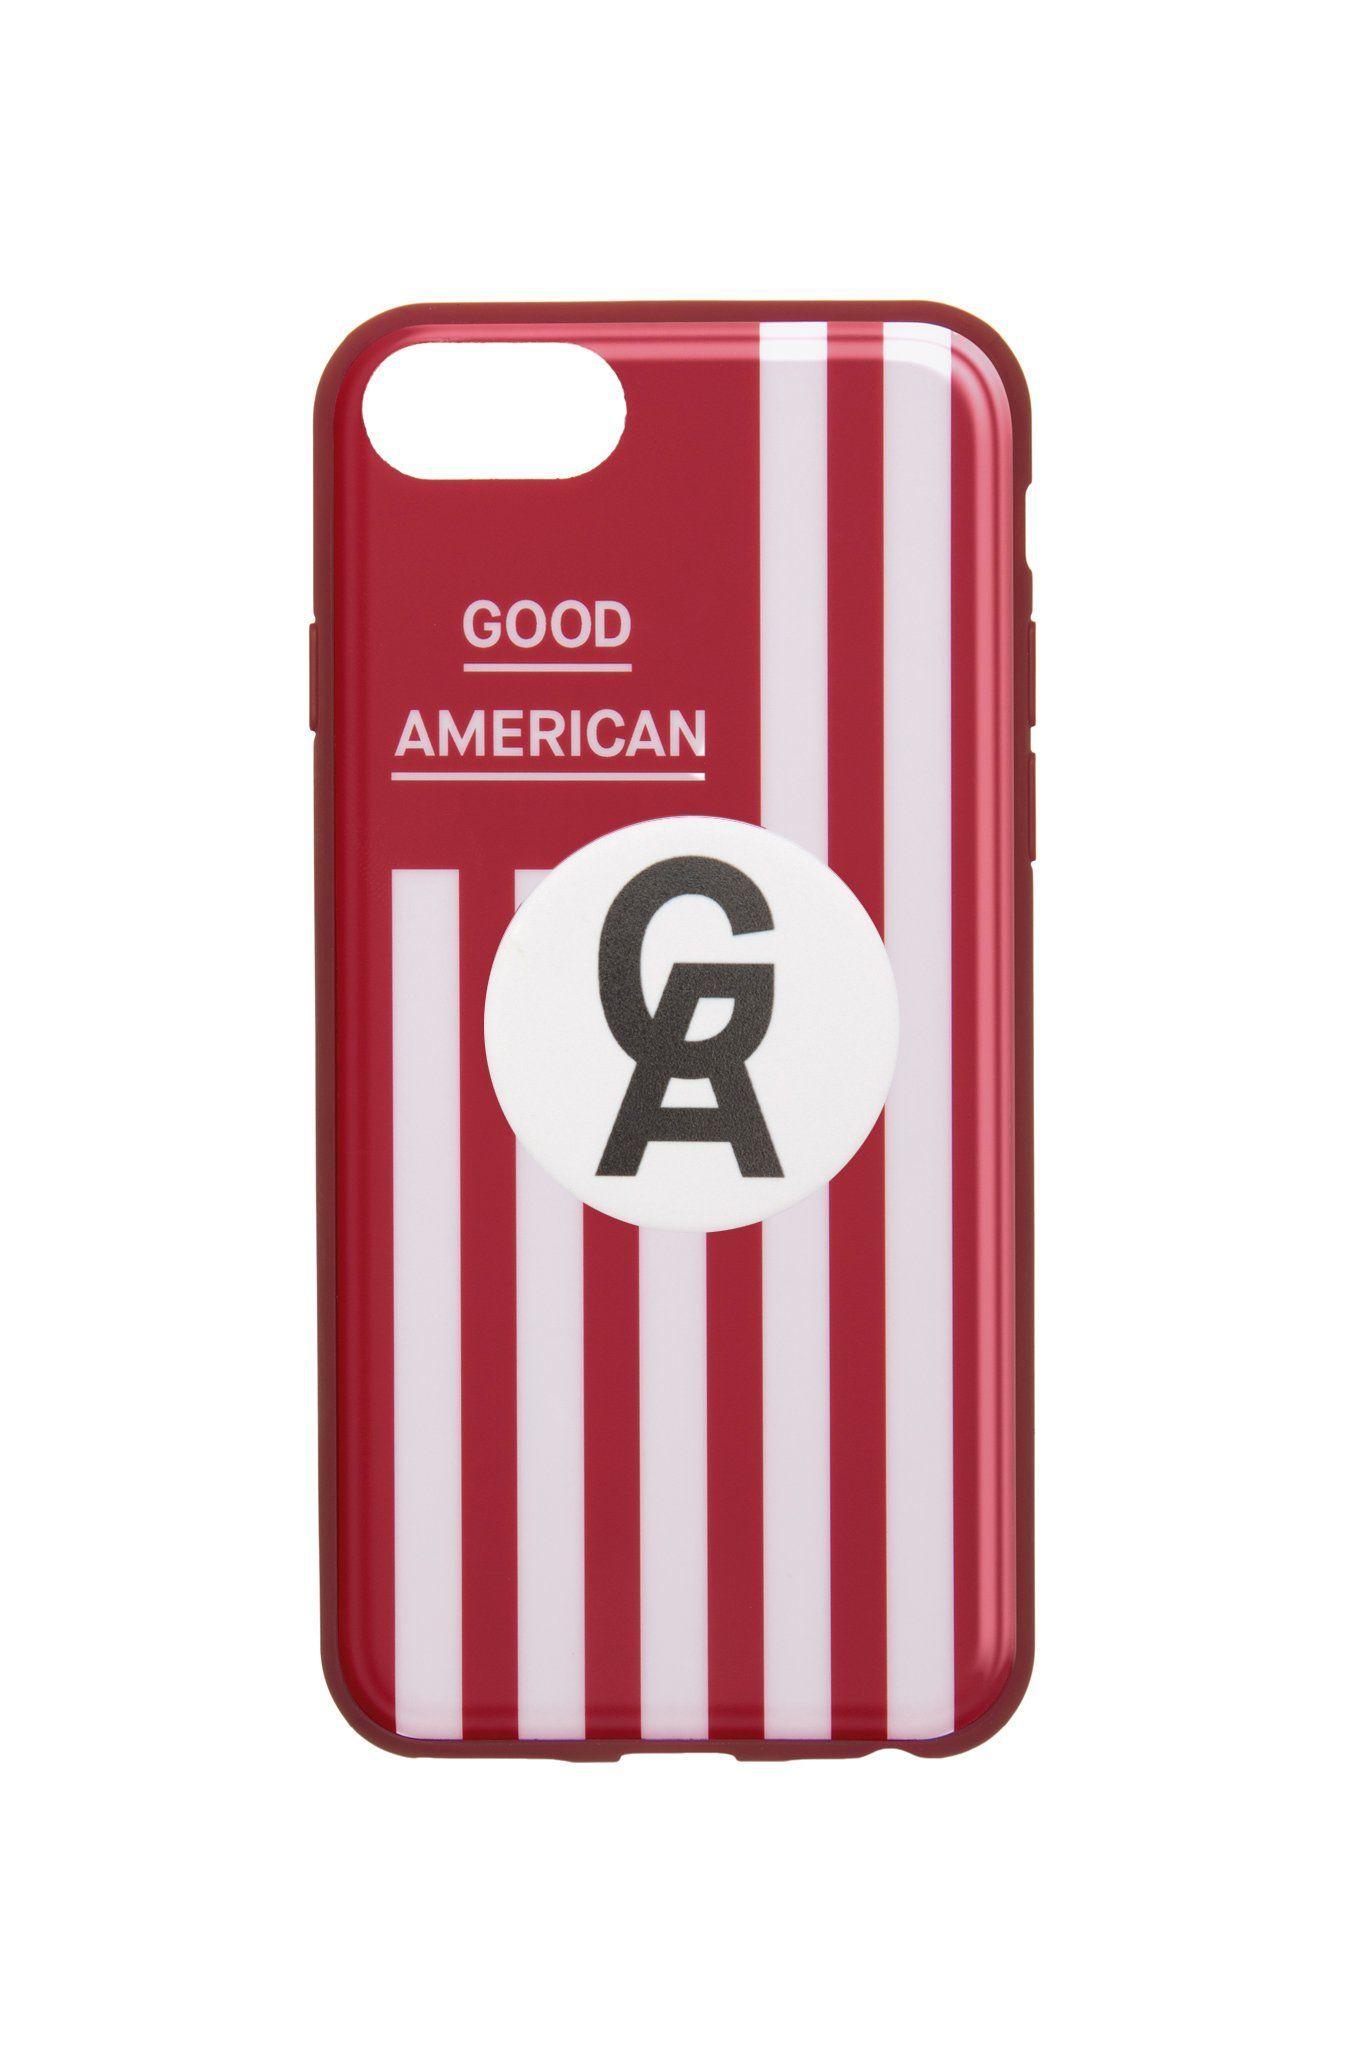 ca45a14b0fe GOODIES ICON POPSOCKET | WHITE001 | Goodies | Popsockets, Logo ...